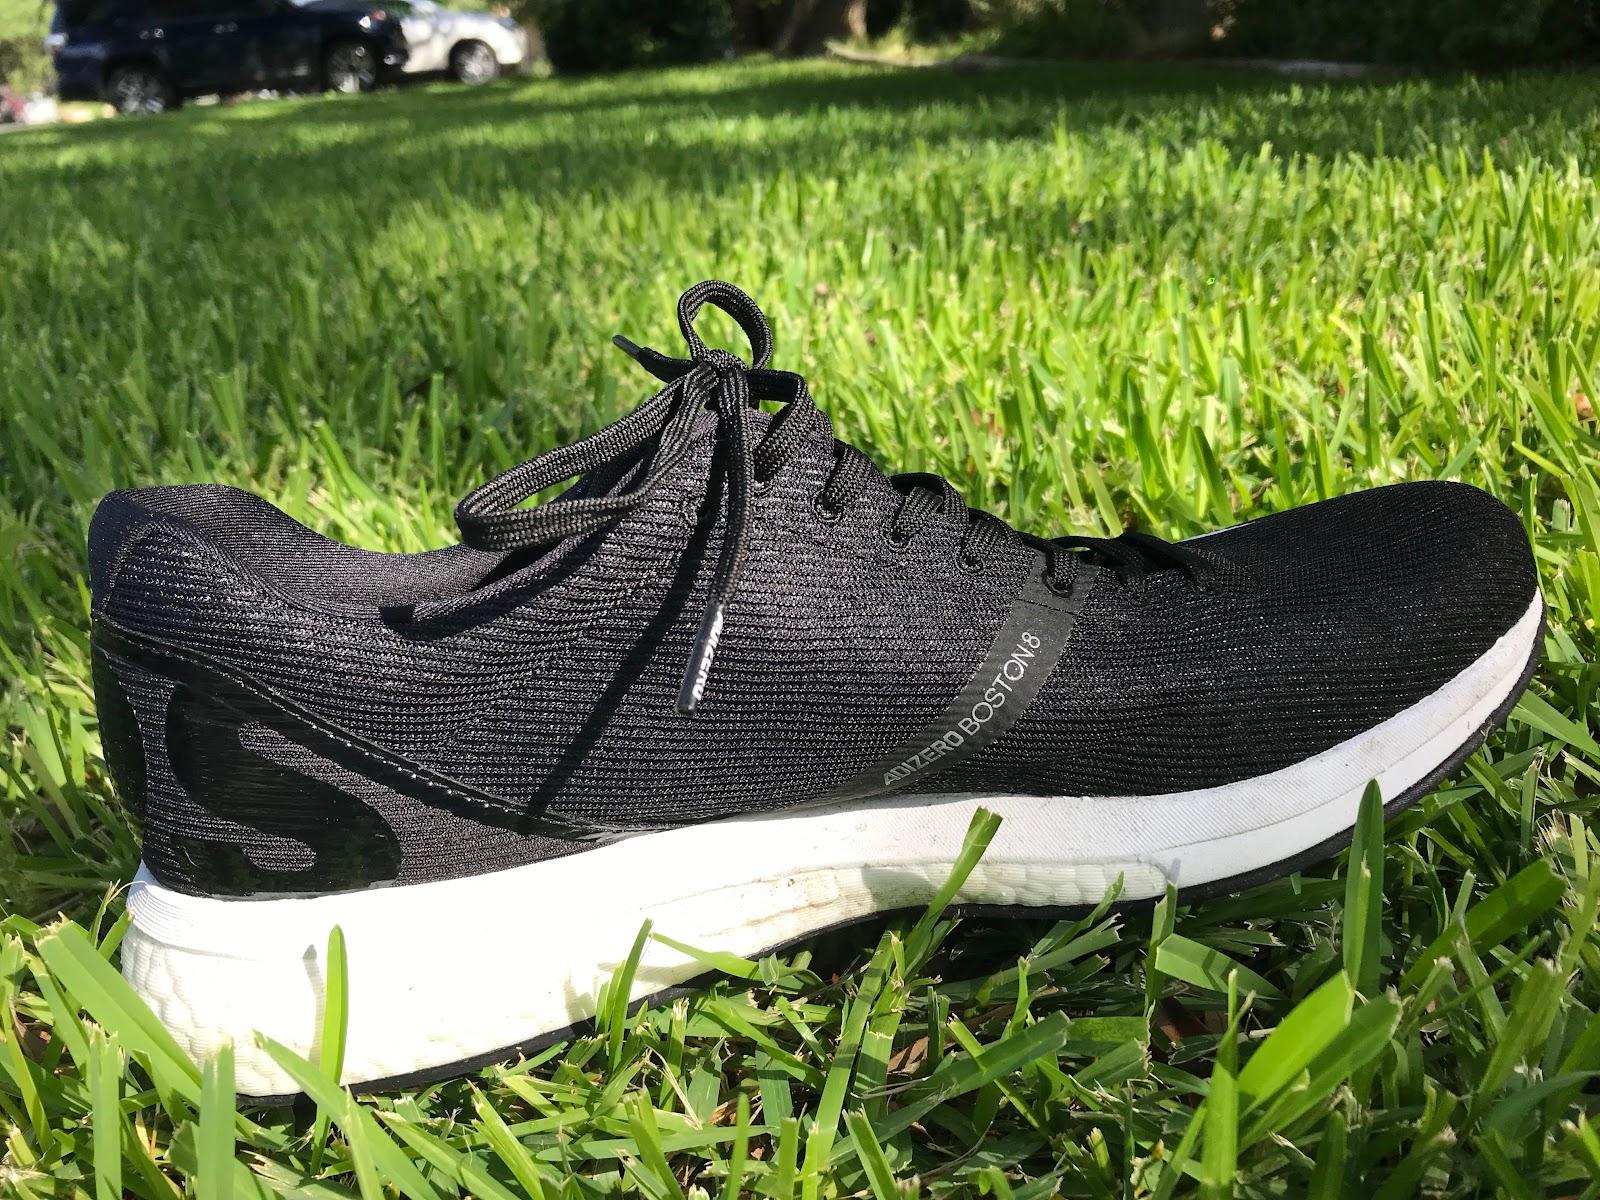 Road Trail Run: adidas adizero Boston 8 Review More than a